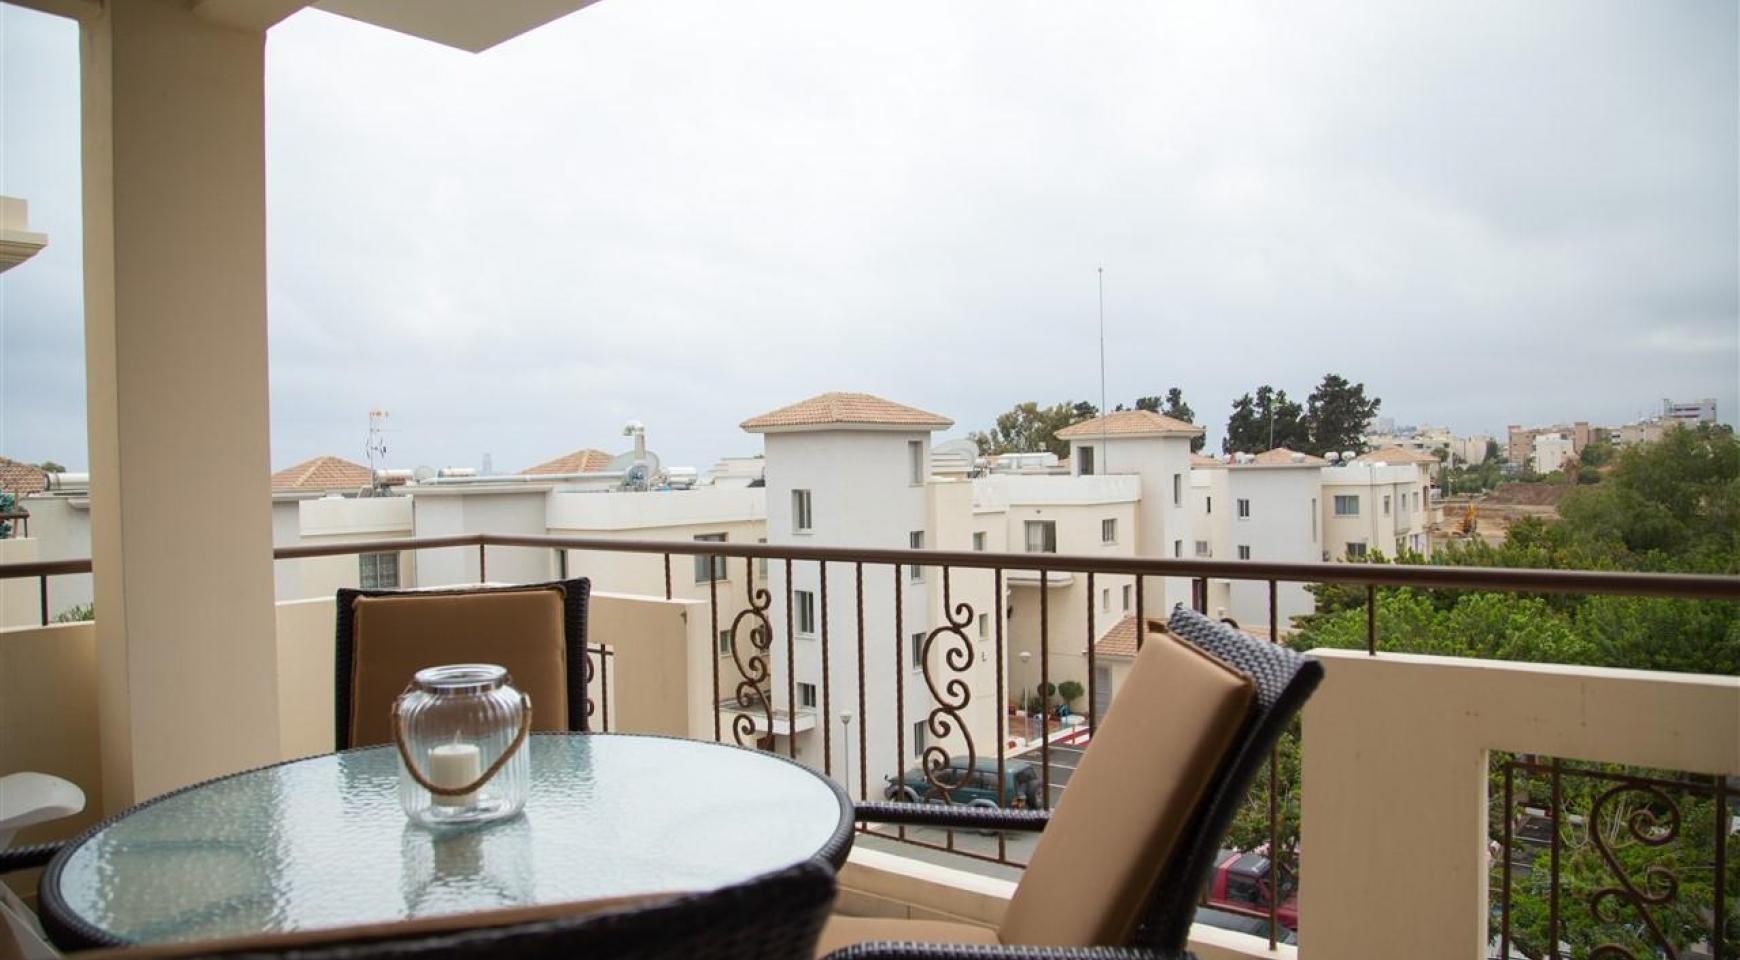 Luxury 2 Bedroom Apartment Mesogios Iris 304 in the Tourist area near the Beach - 26